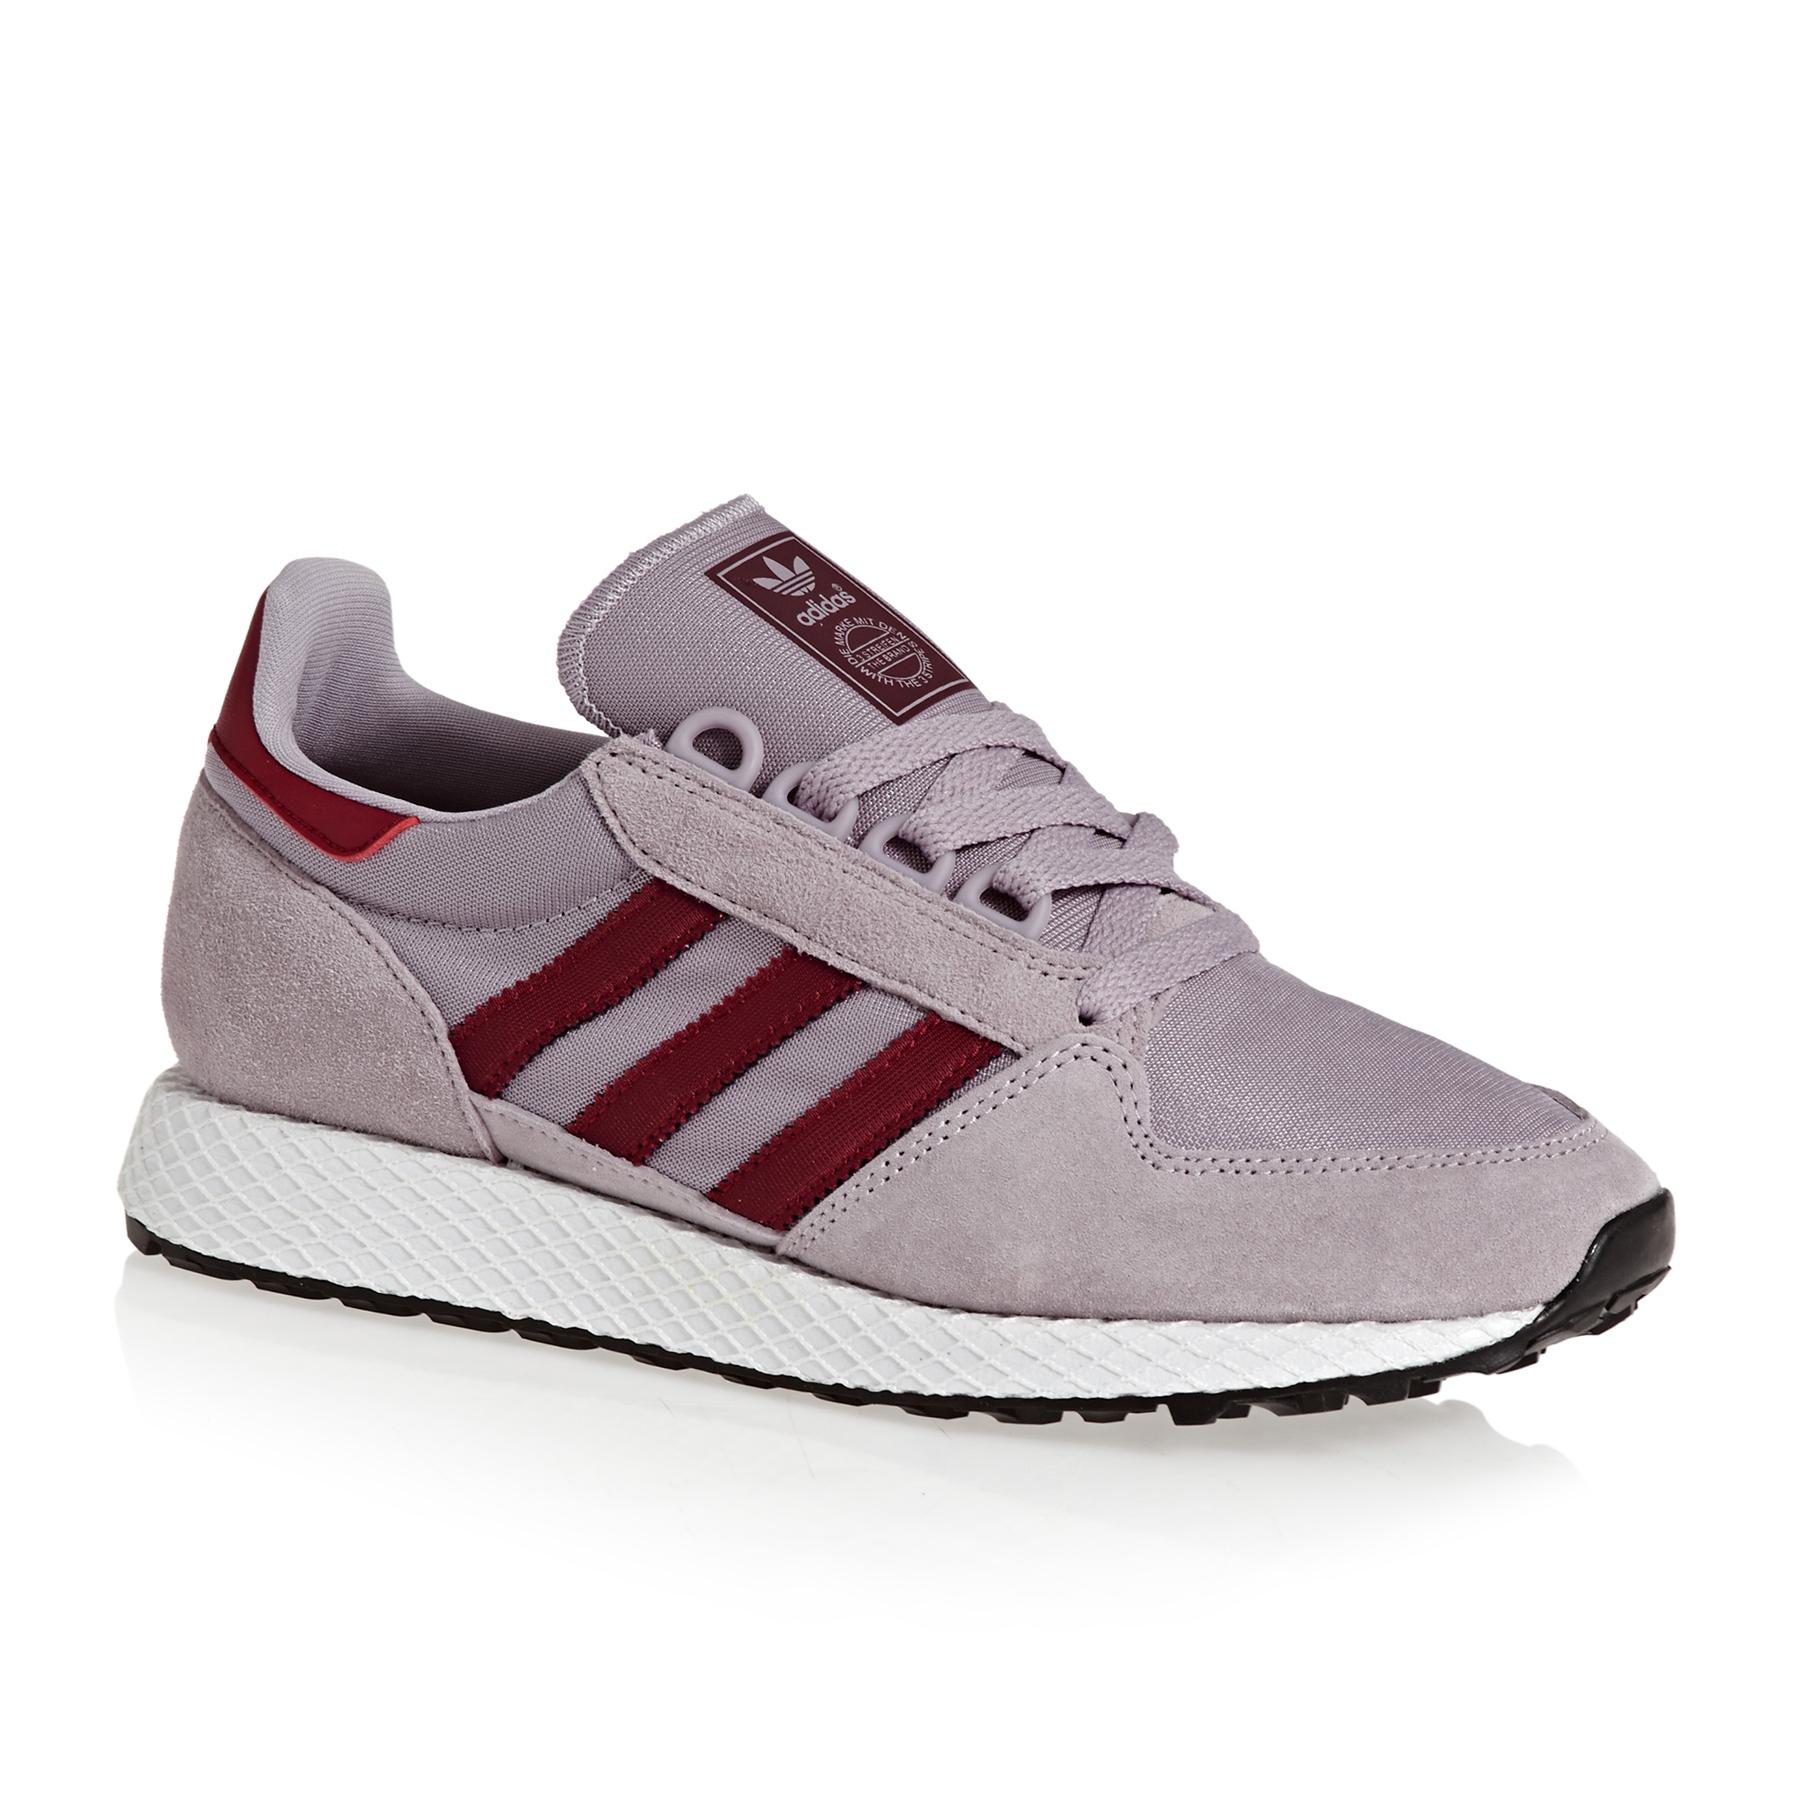 Adidas Originals Forest Grove Damen Schuhe Free Delivery